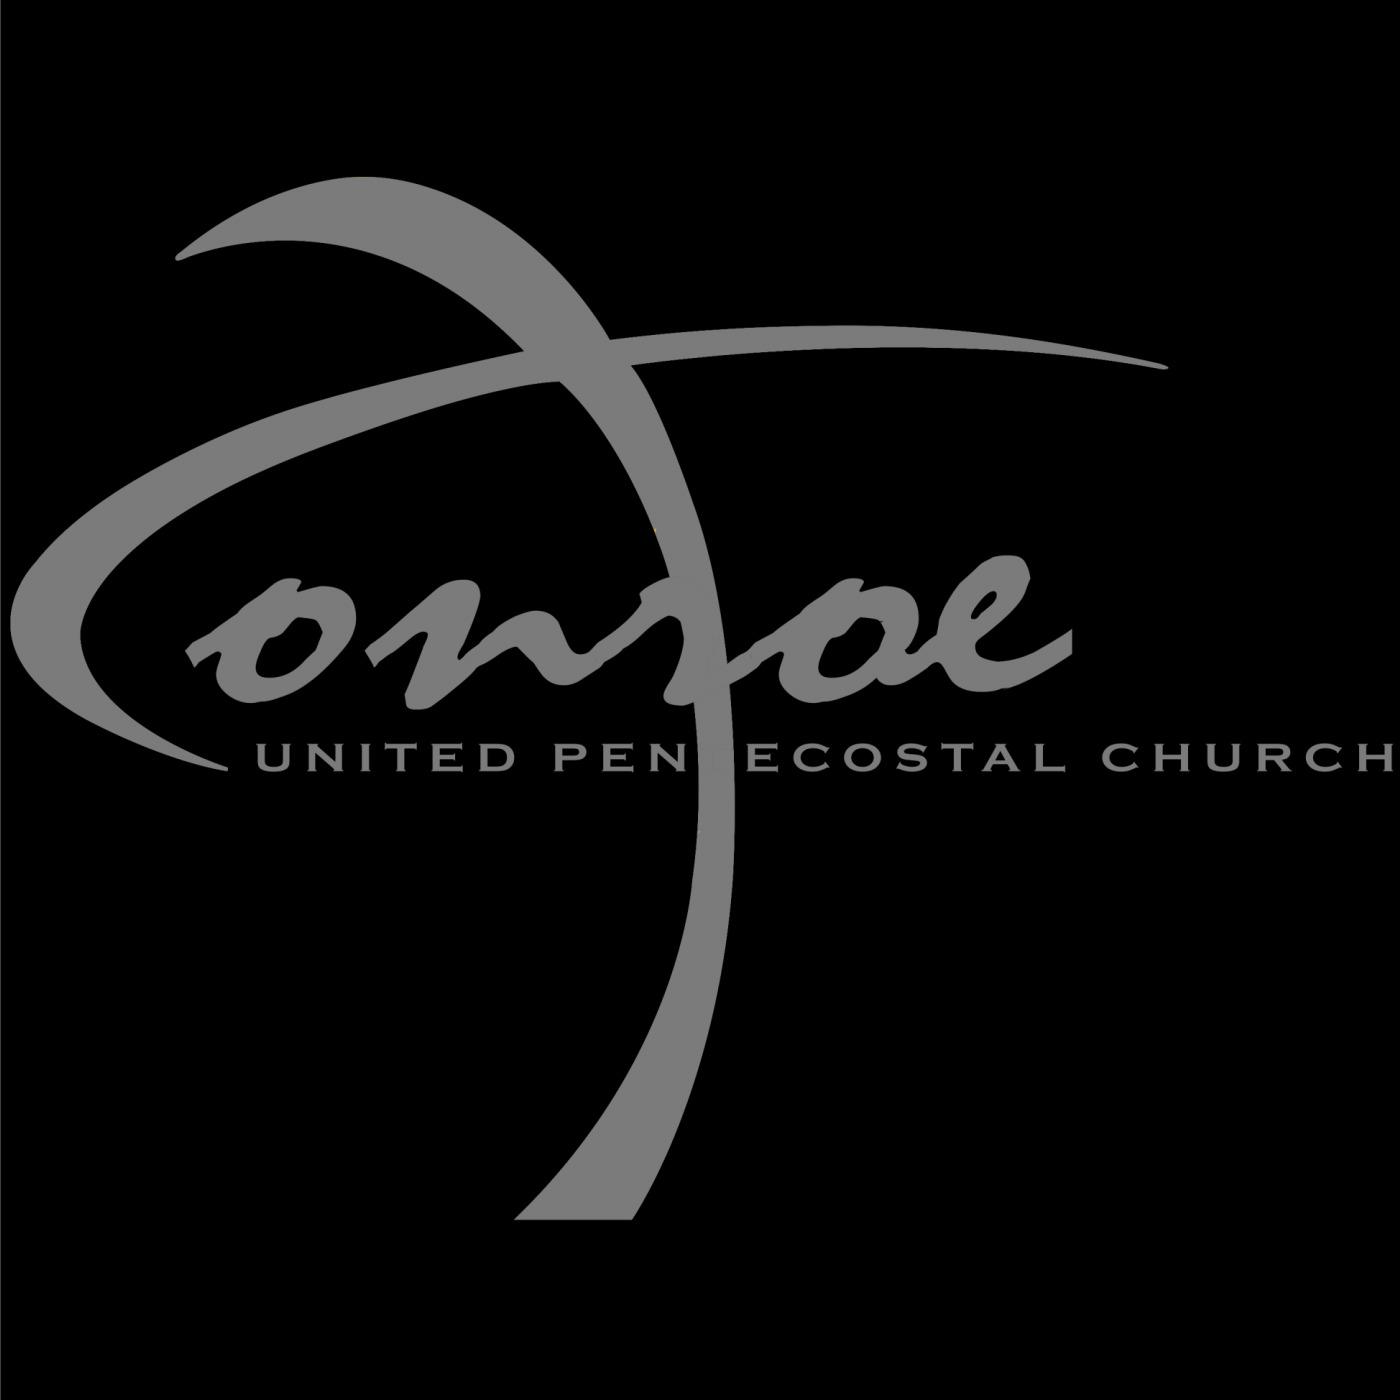 Conroe United Pentecostal Church